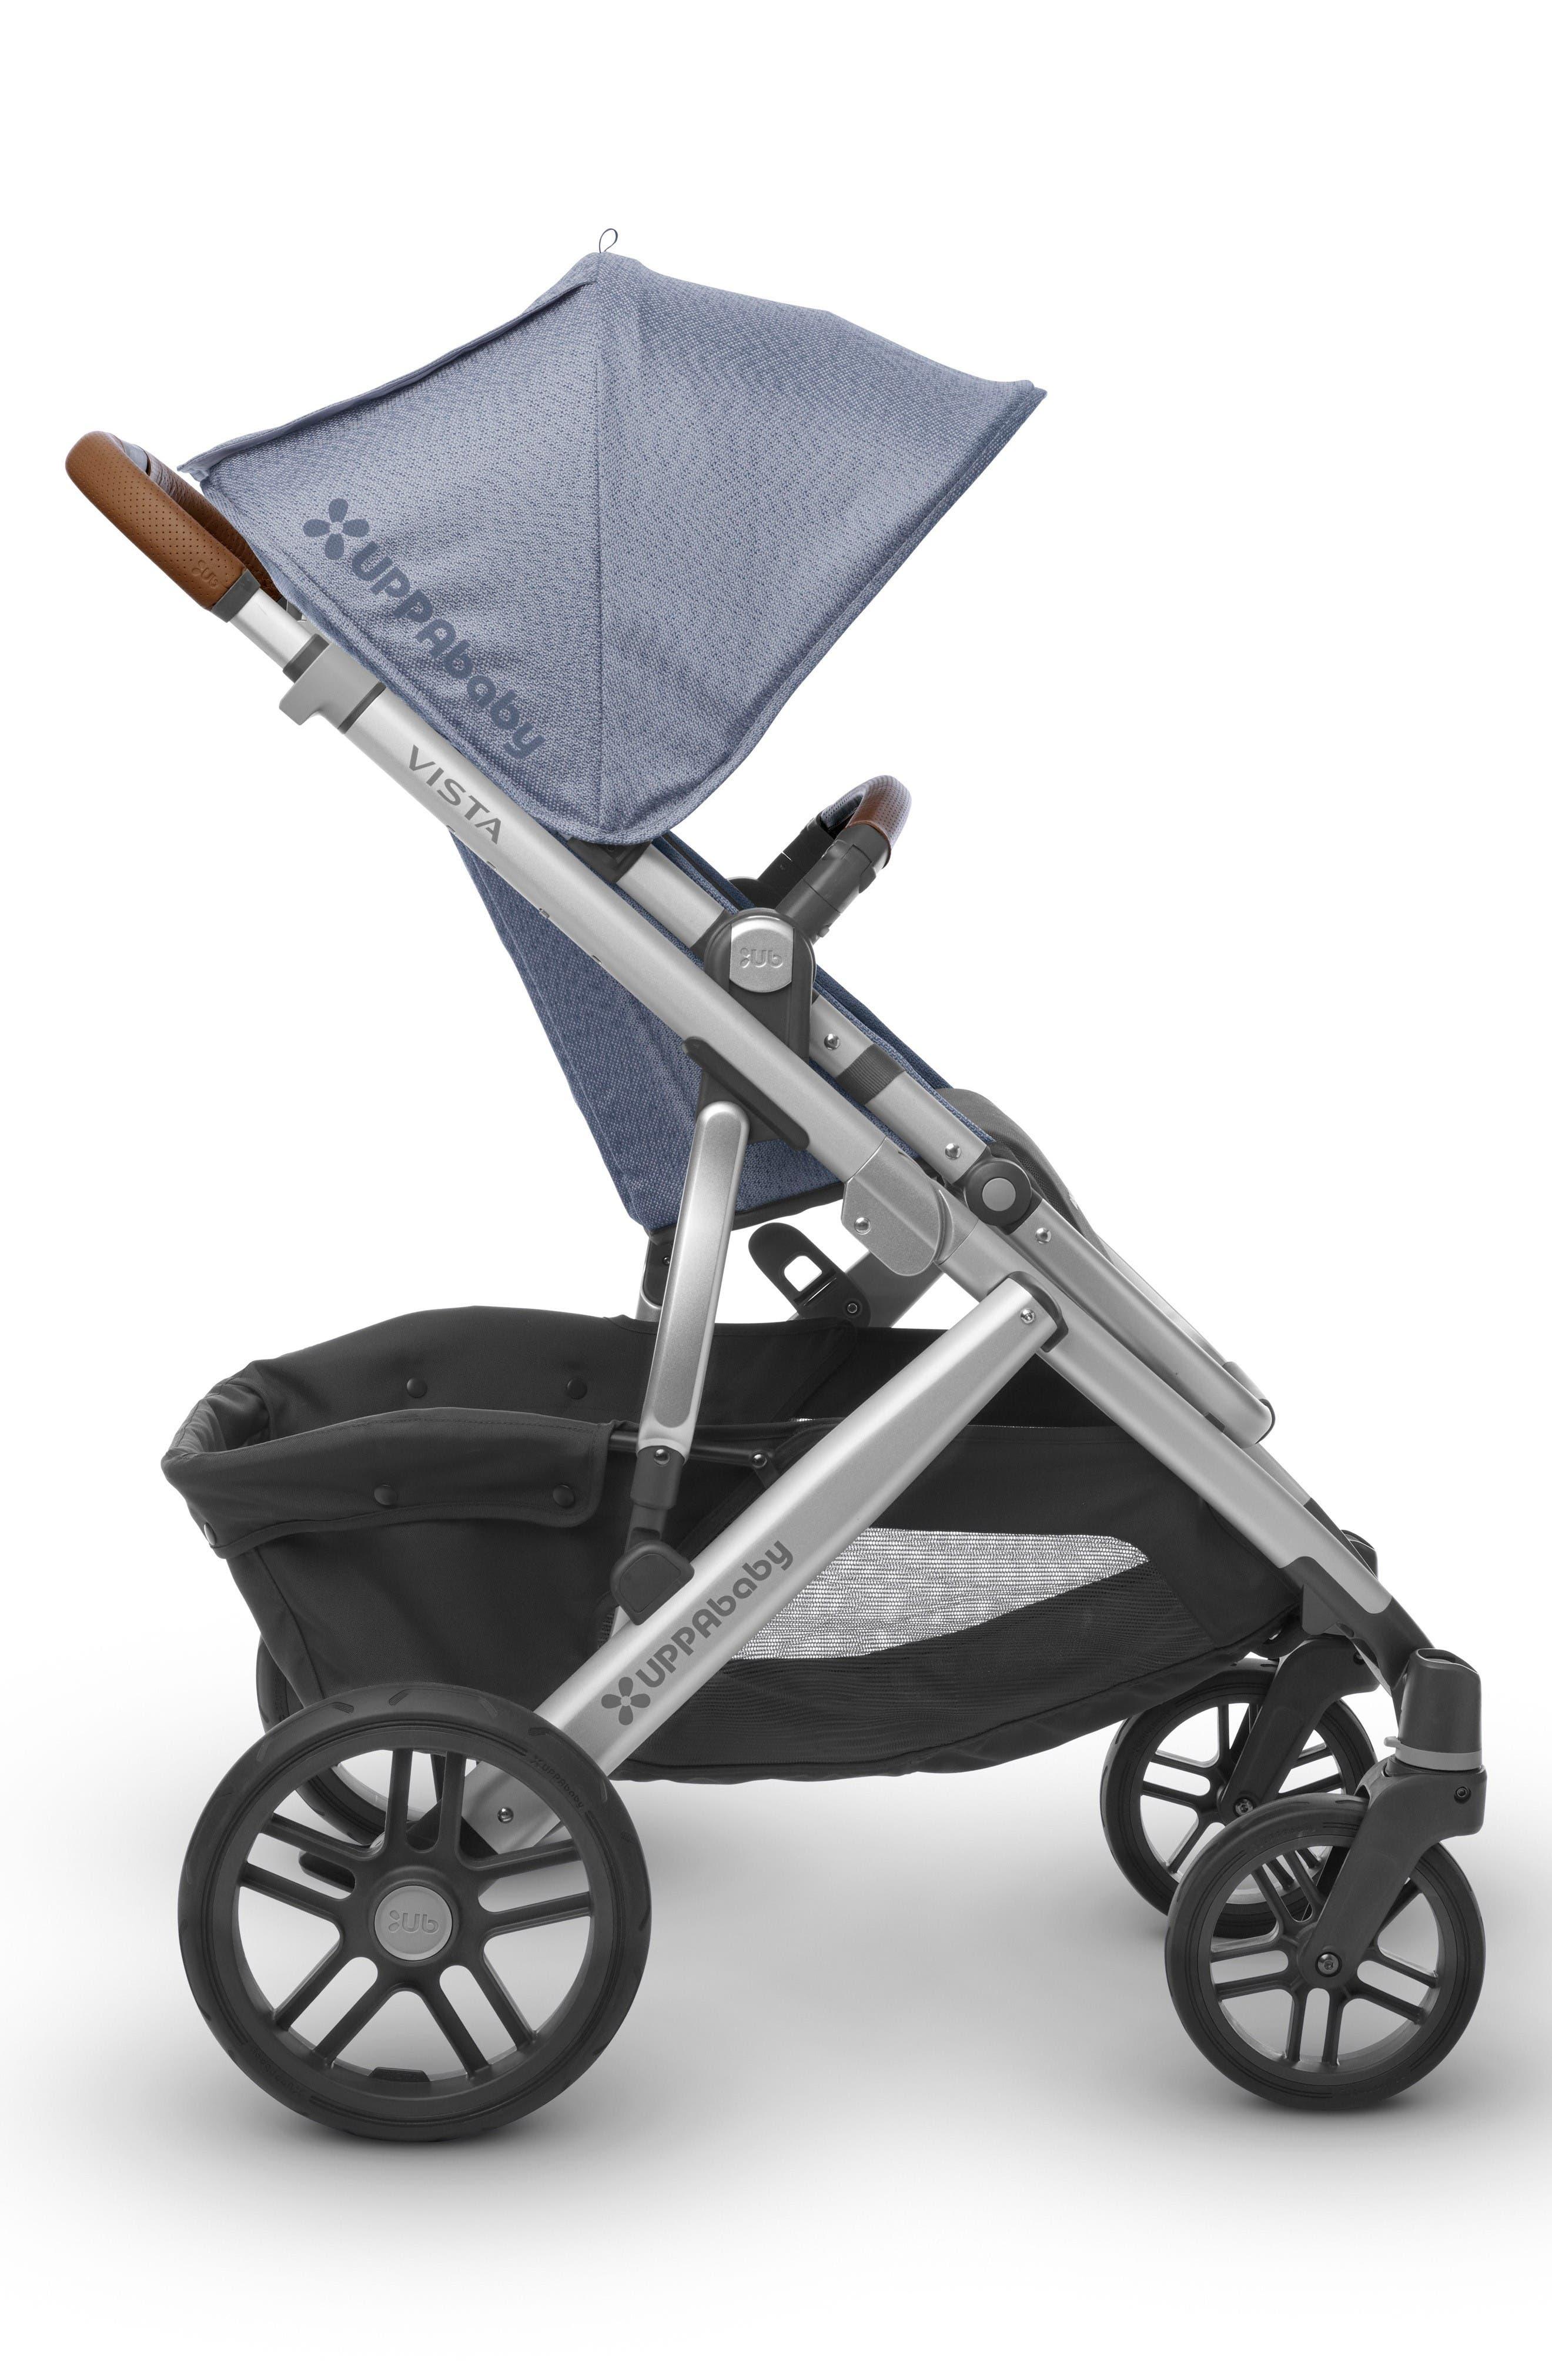 2017 VISTA Henry Aluminum Frame Convertible Stroller with Bassinet & Toddler Seat,                             Alternate thumbnail 2, color,                             Blue Marl